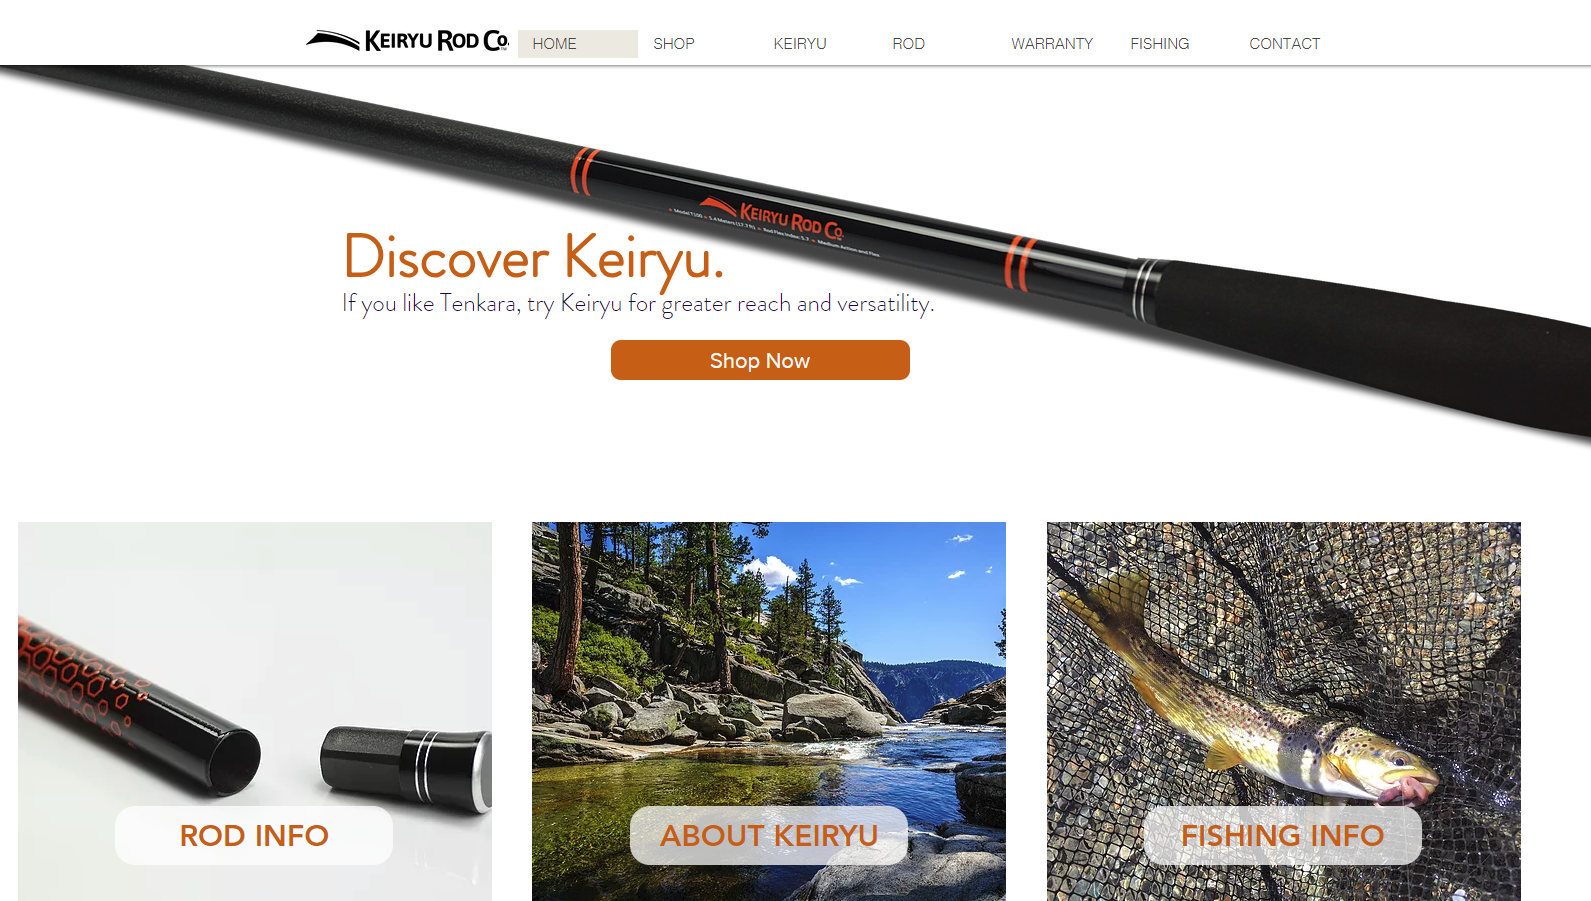 6f683da3ebe Troutrageous! Fly Fishing   Tenkara Blog  Discover Keiryu Rod Co.